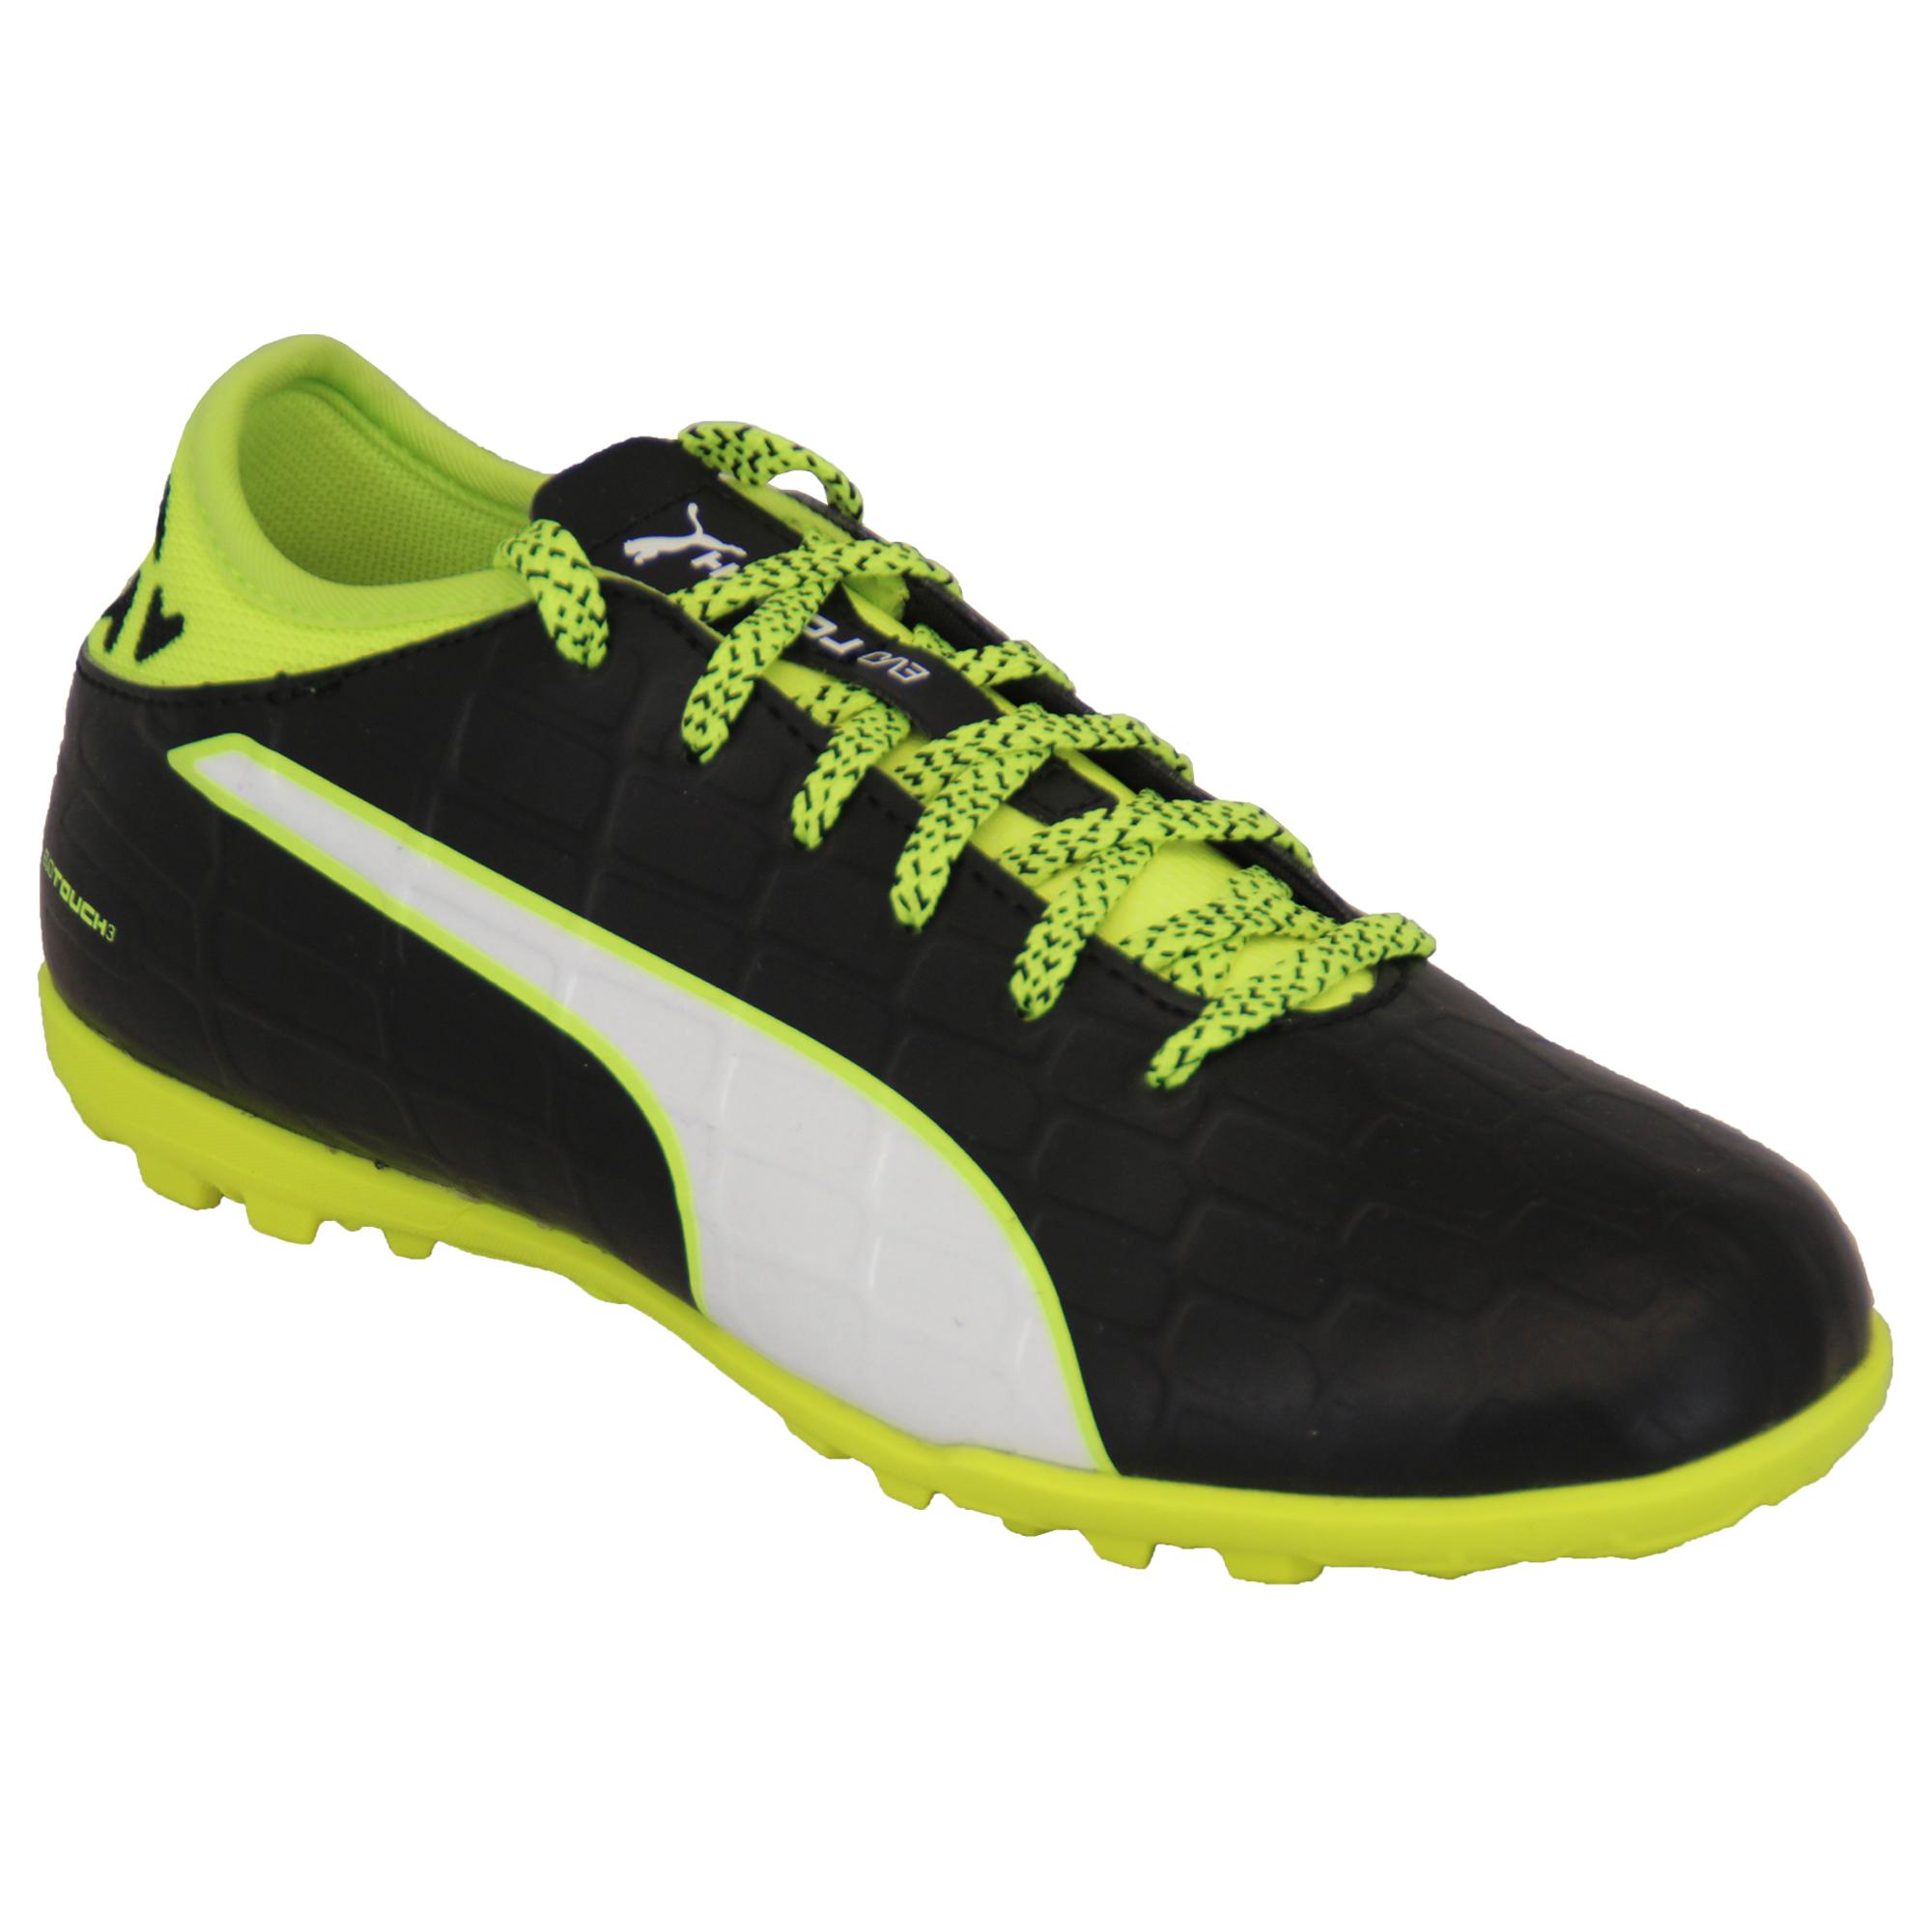 Puma Football Tactile Garçons Enfants De Chaussures Evo Turf Astro gxBpt